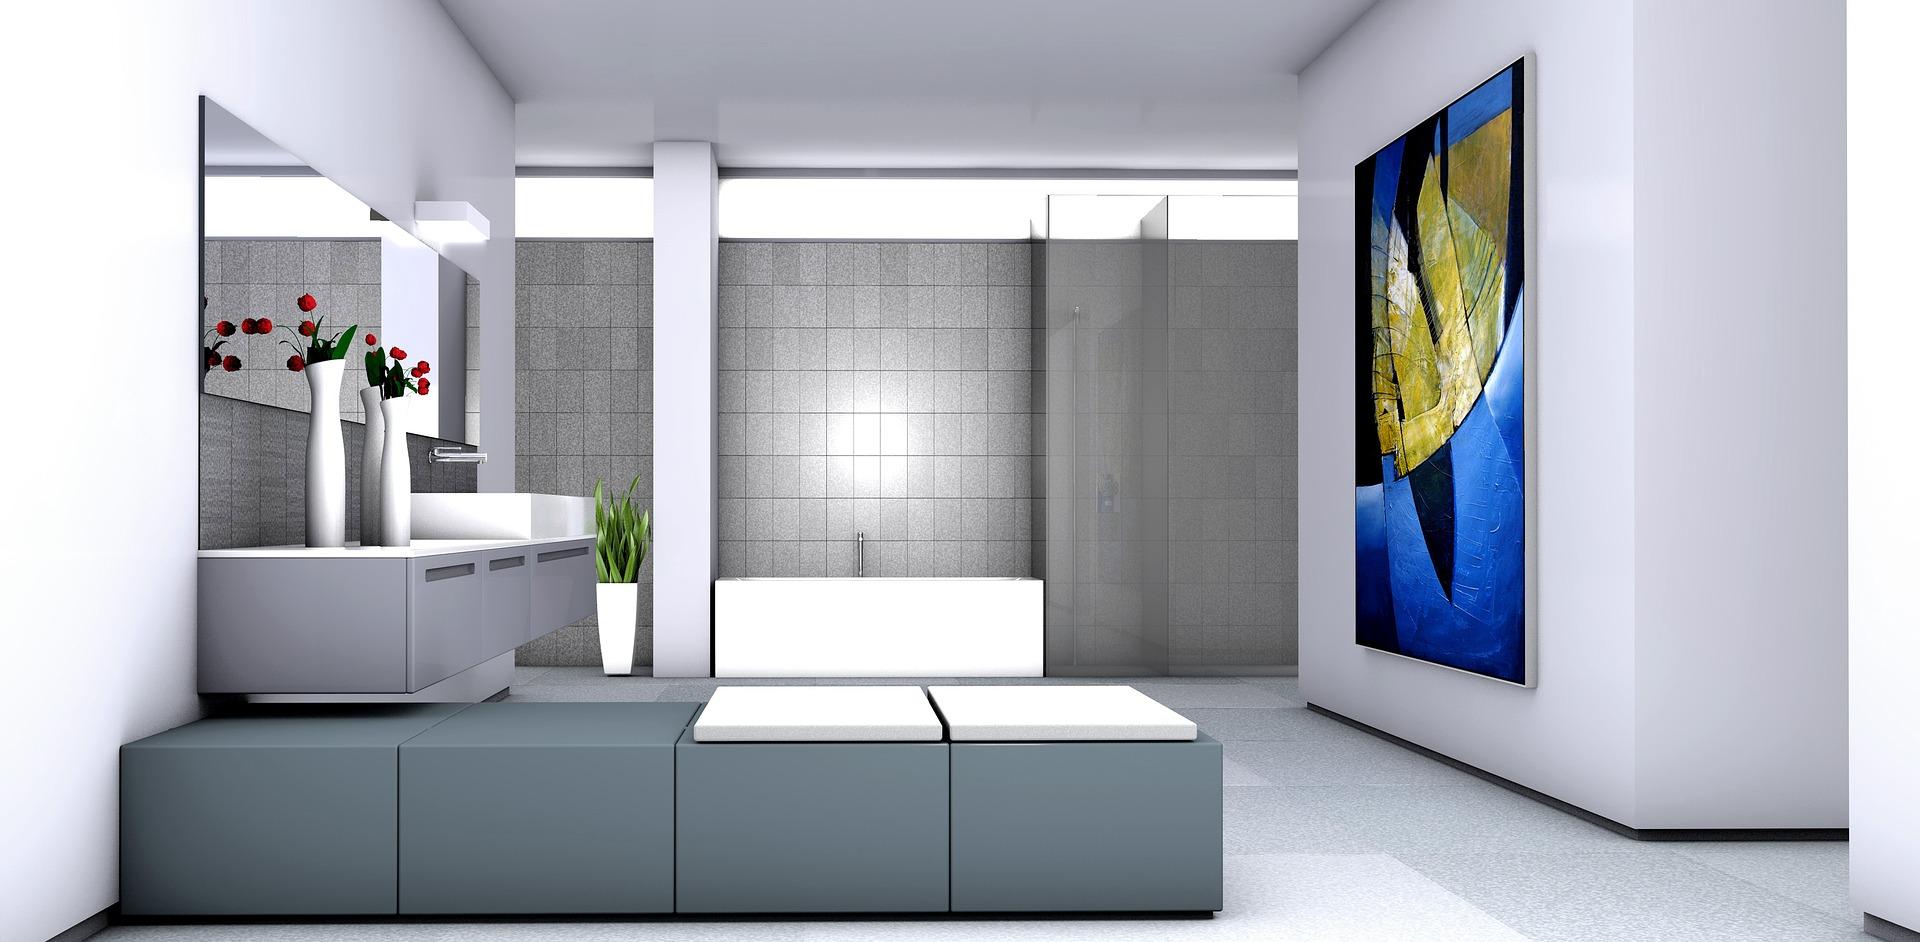 bathroom-1770212_1920.jpg